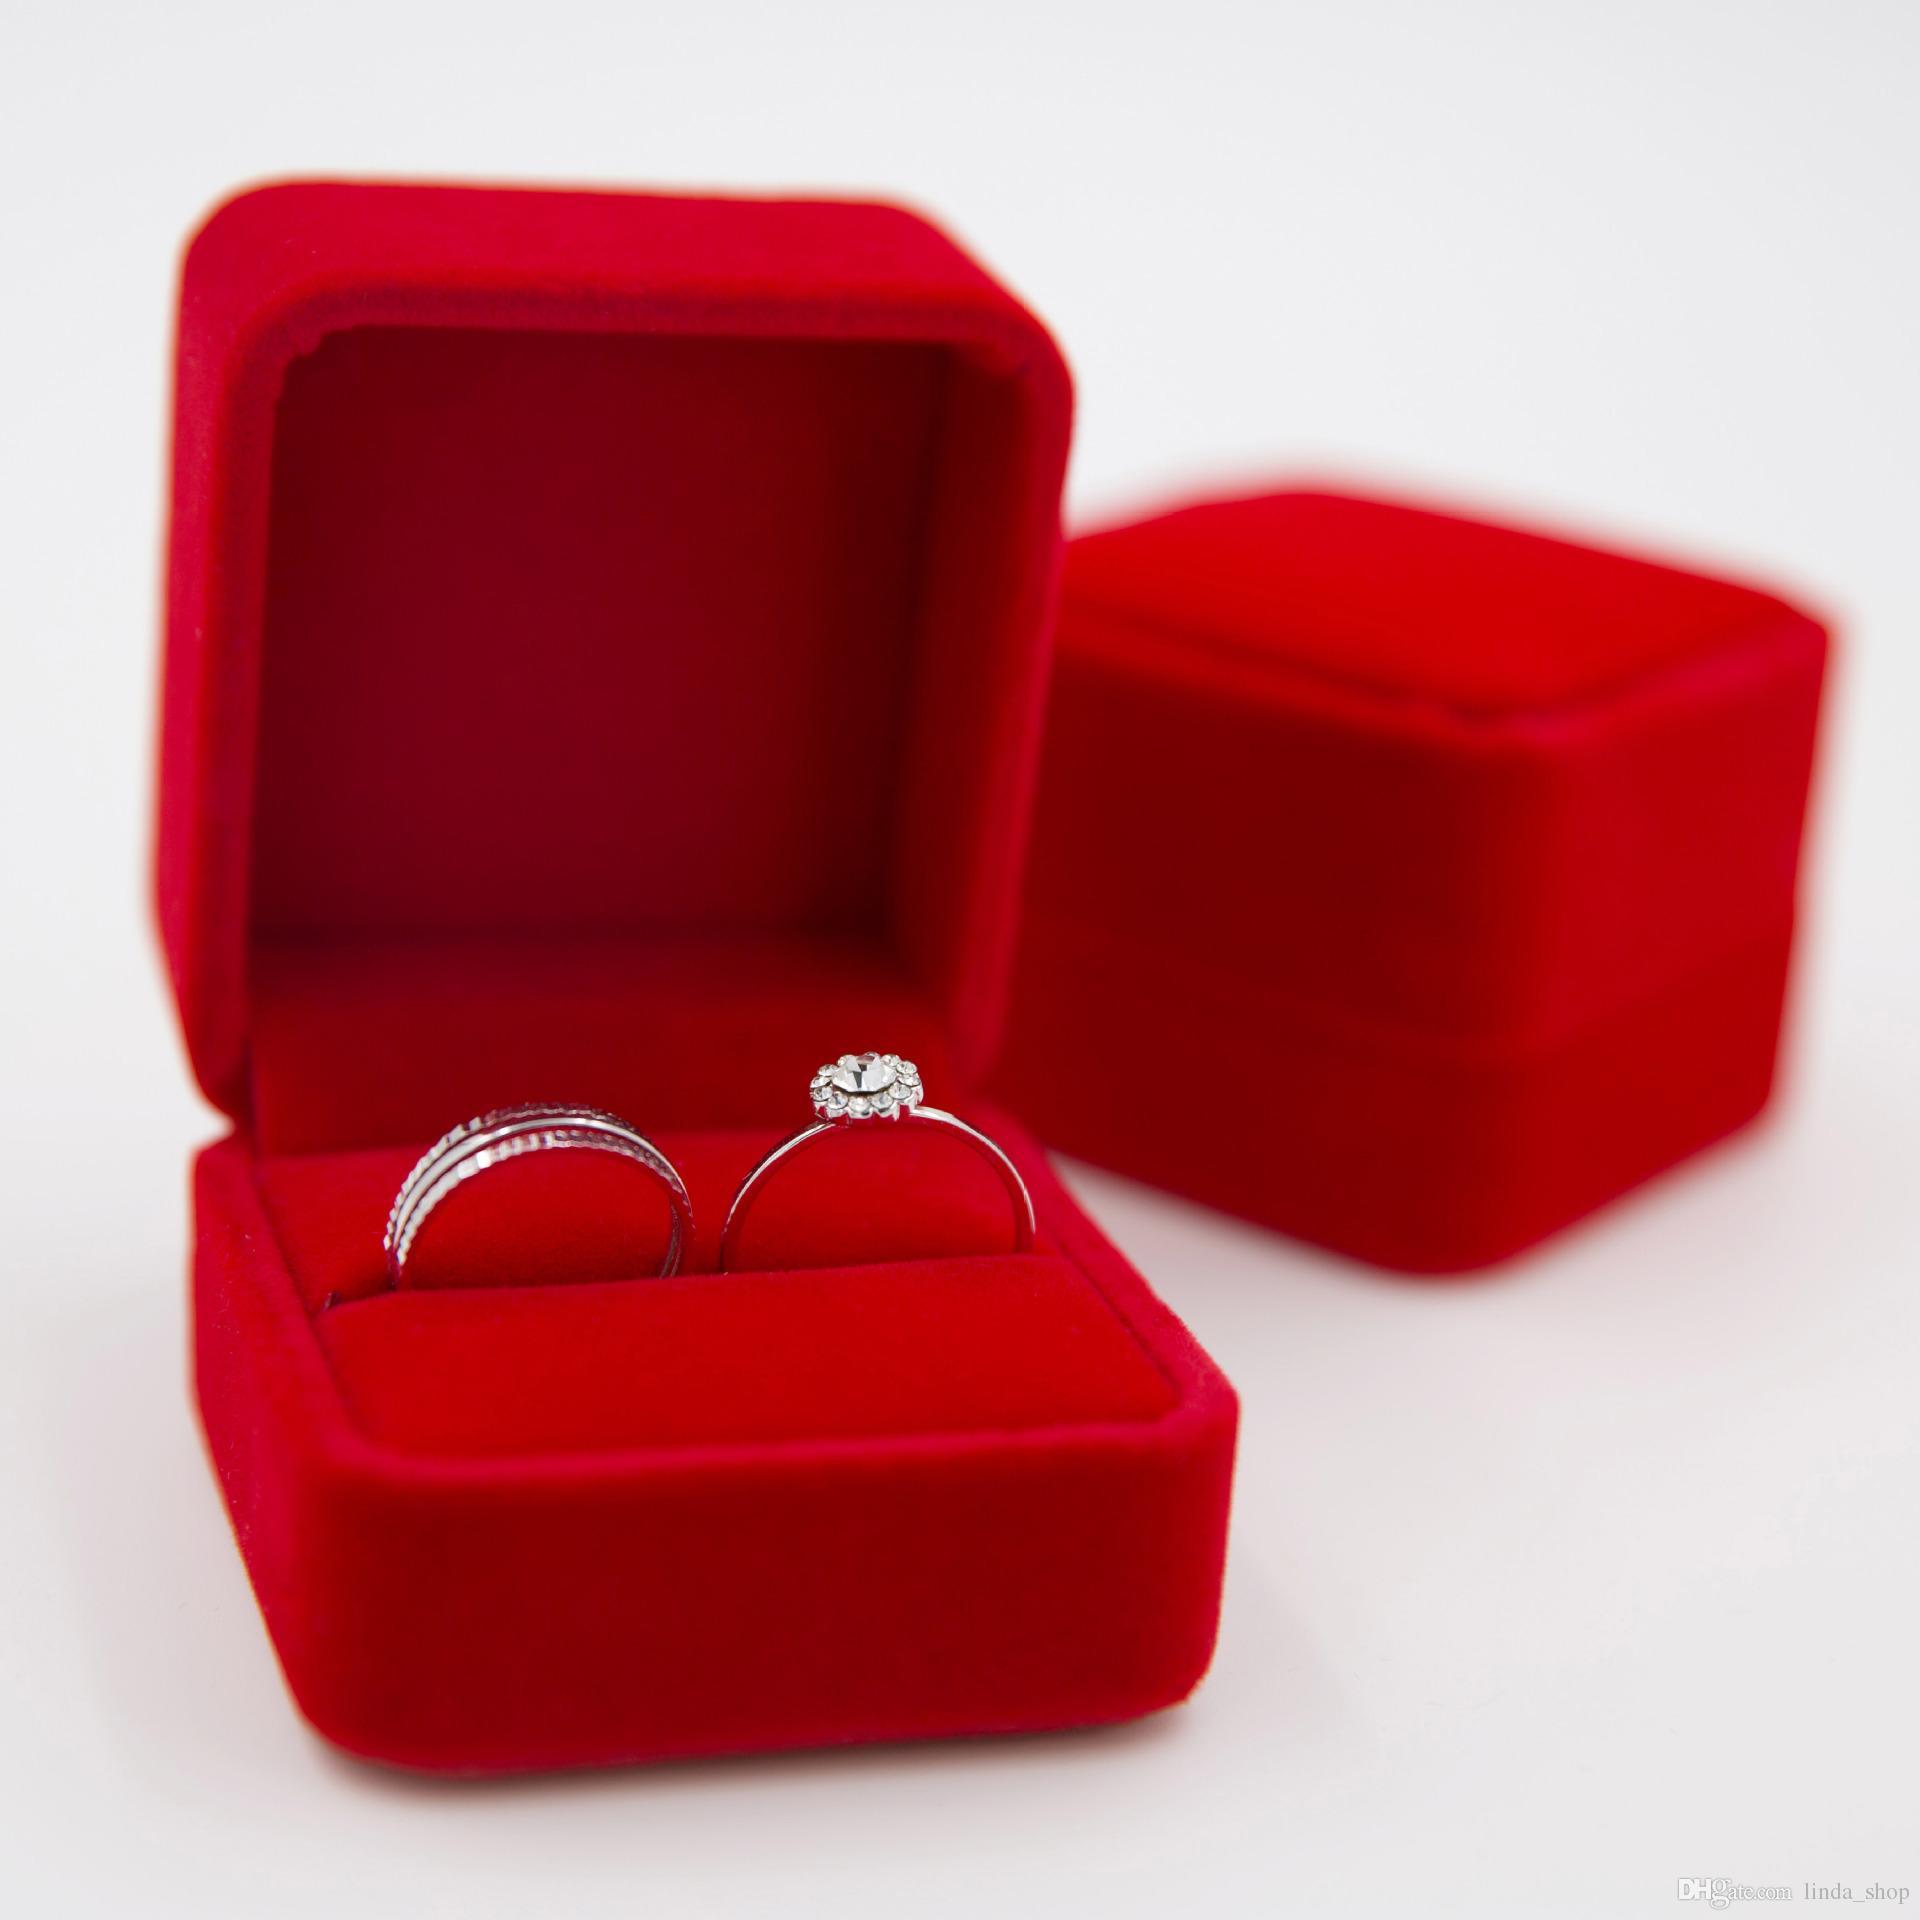 Stupendous Ceremony Uk Ring Bearer Wedding Ring Boxes Velvet Round Red Ring Box Jewelry Boxeswedding Ring Box 2018 From Wedding Ring Box Wedding Decor Ideas Wedding Ring Box wedding rings Wedding Ring Box